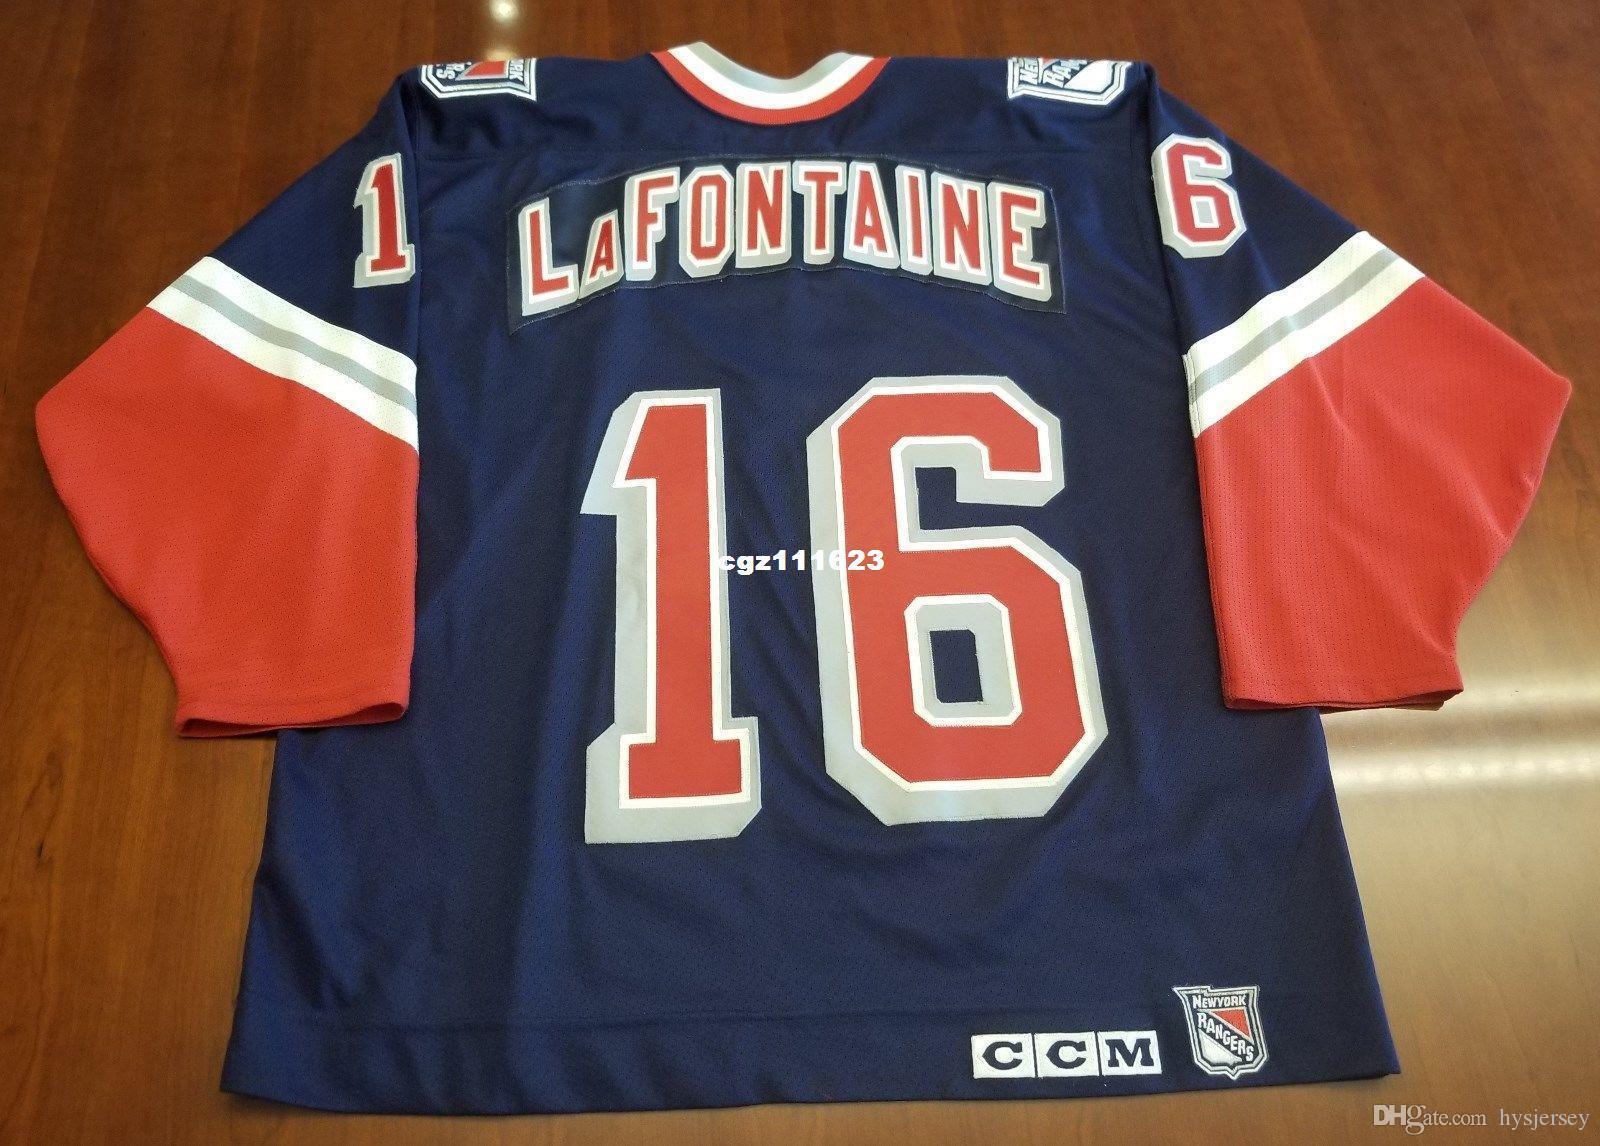 868a2747dd4 2019 Wholesale Custom Pat LaFontaine Vintage New York Rangers CCM Cheap  Hockey Jersey Lady Liberty Mens Retro Jerseys From Hysjersey, $25.29    DHgate.Com